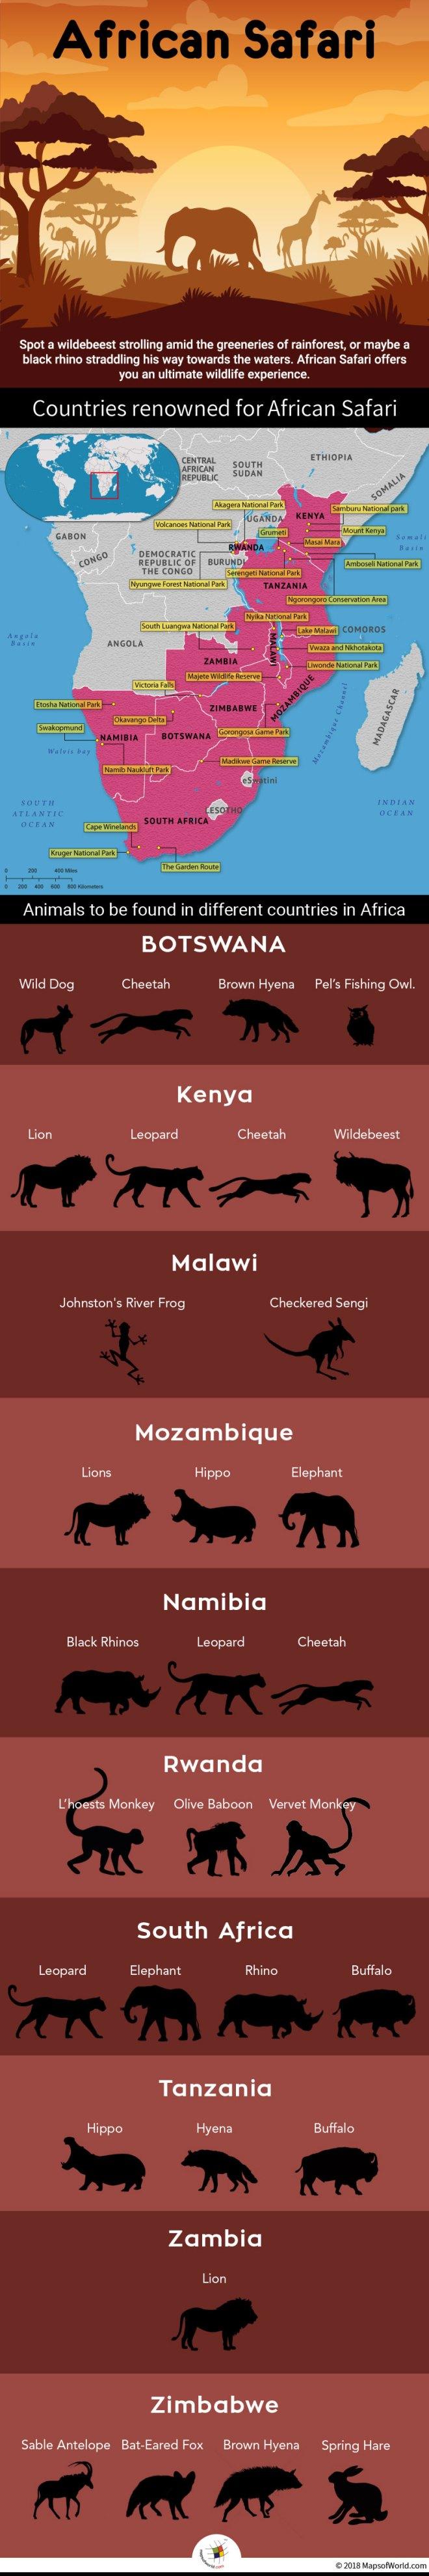 best destinations for African Safari